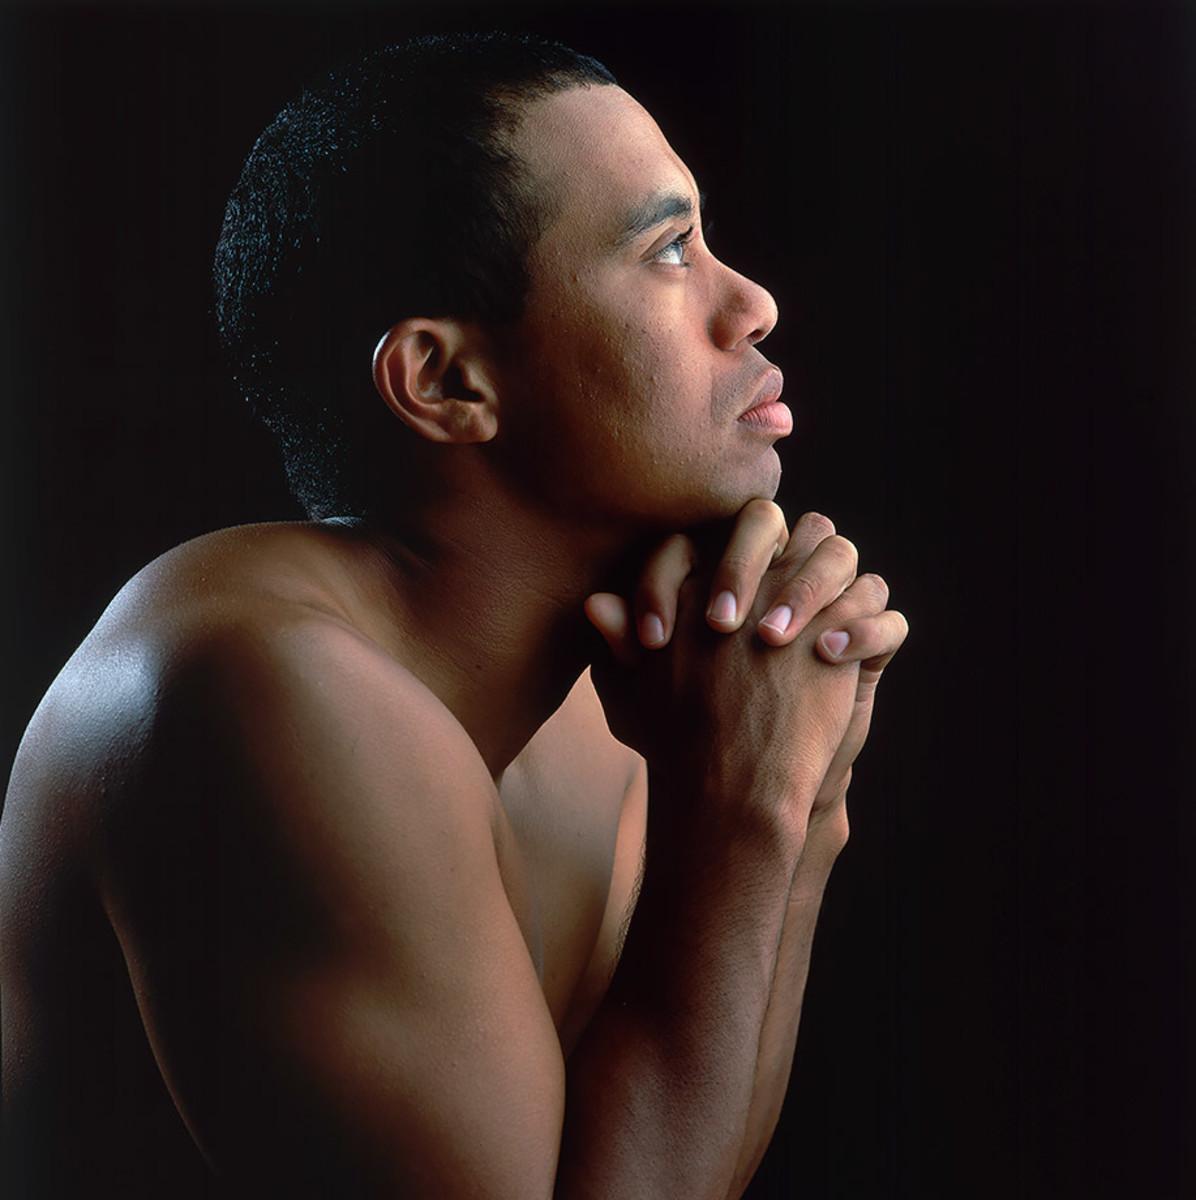 2000-1121-Tiger-Woods-001230529.jpg